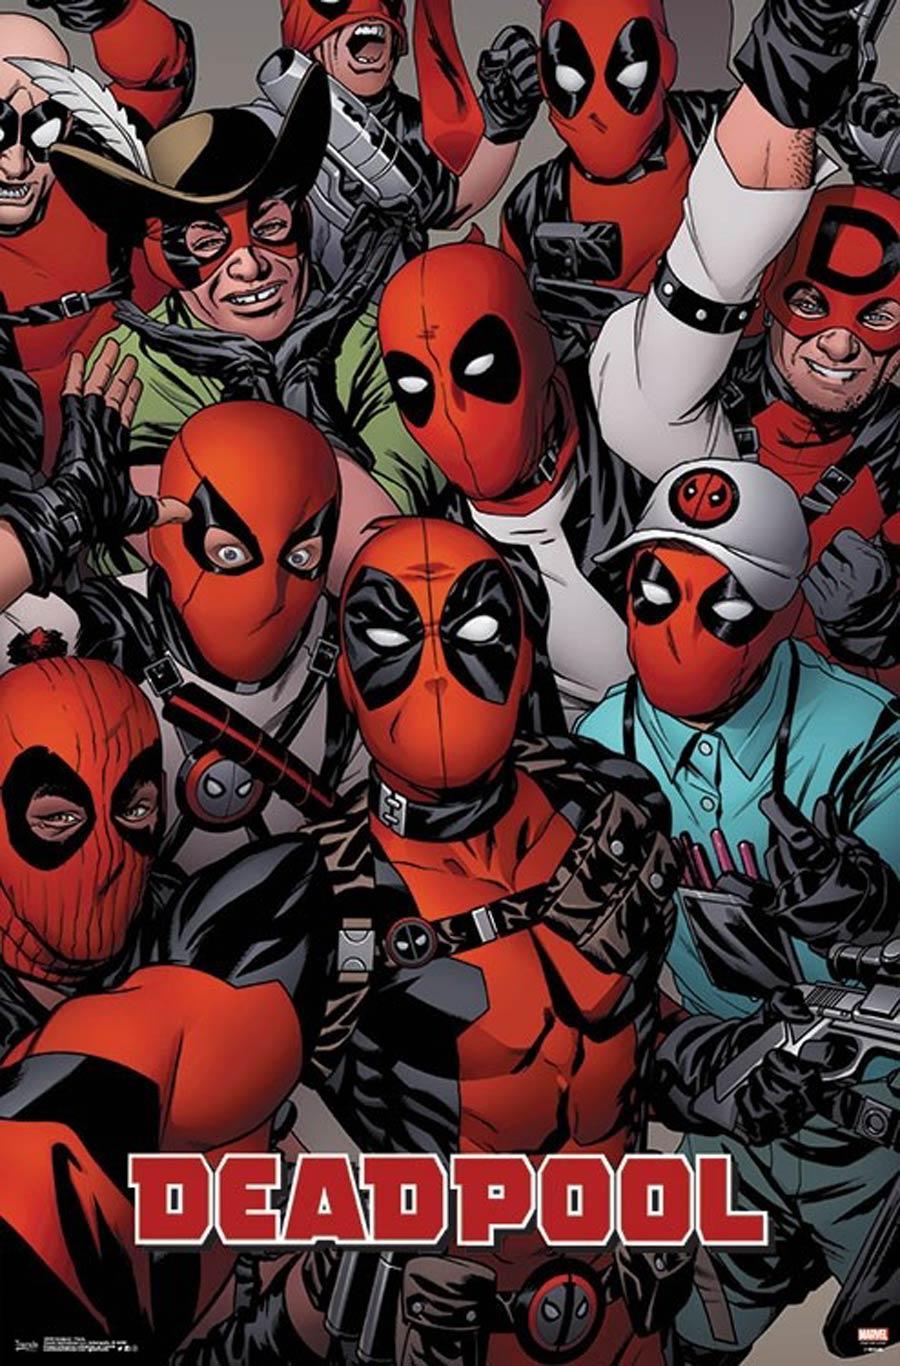 Deadpool Faces Poster